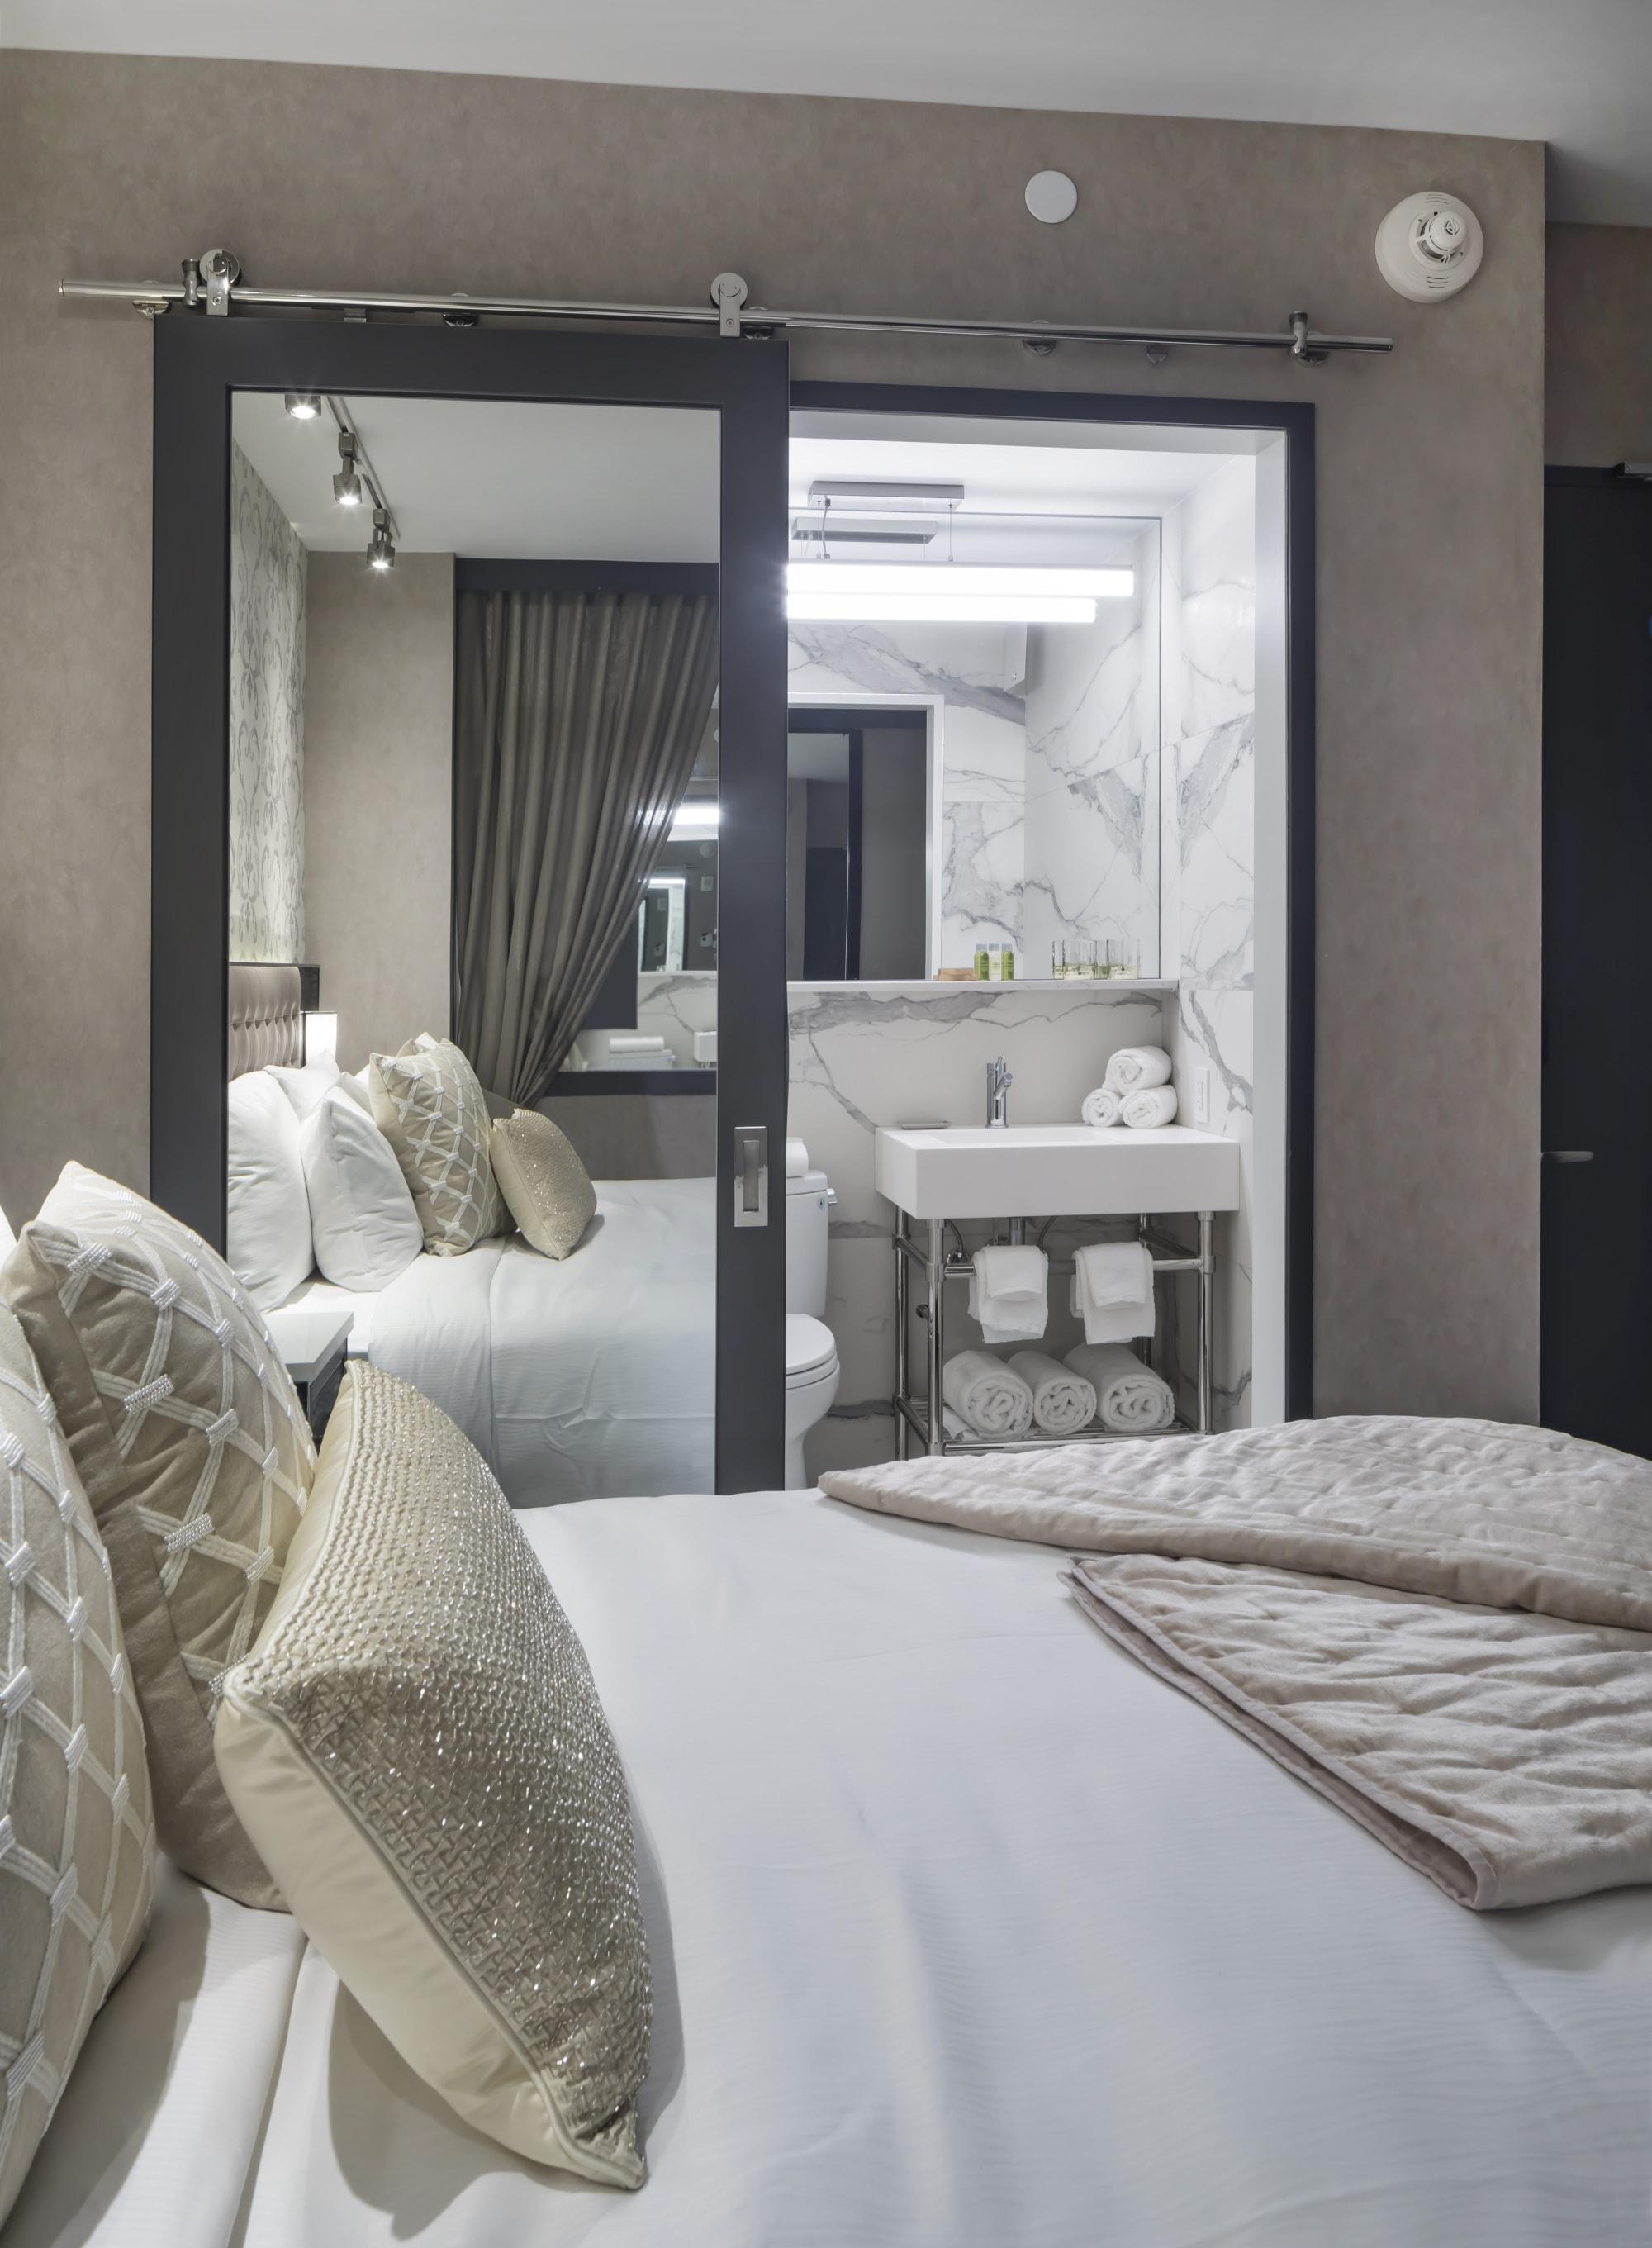 Interior Design by Lemay + Escobar seen at Aliz Hotel, New York - Interior Design